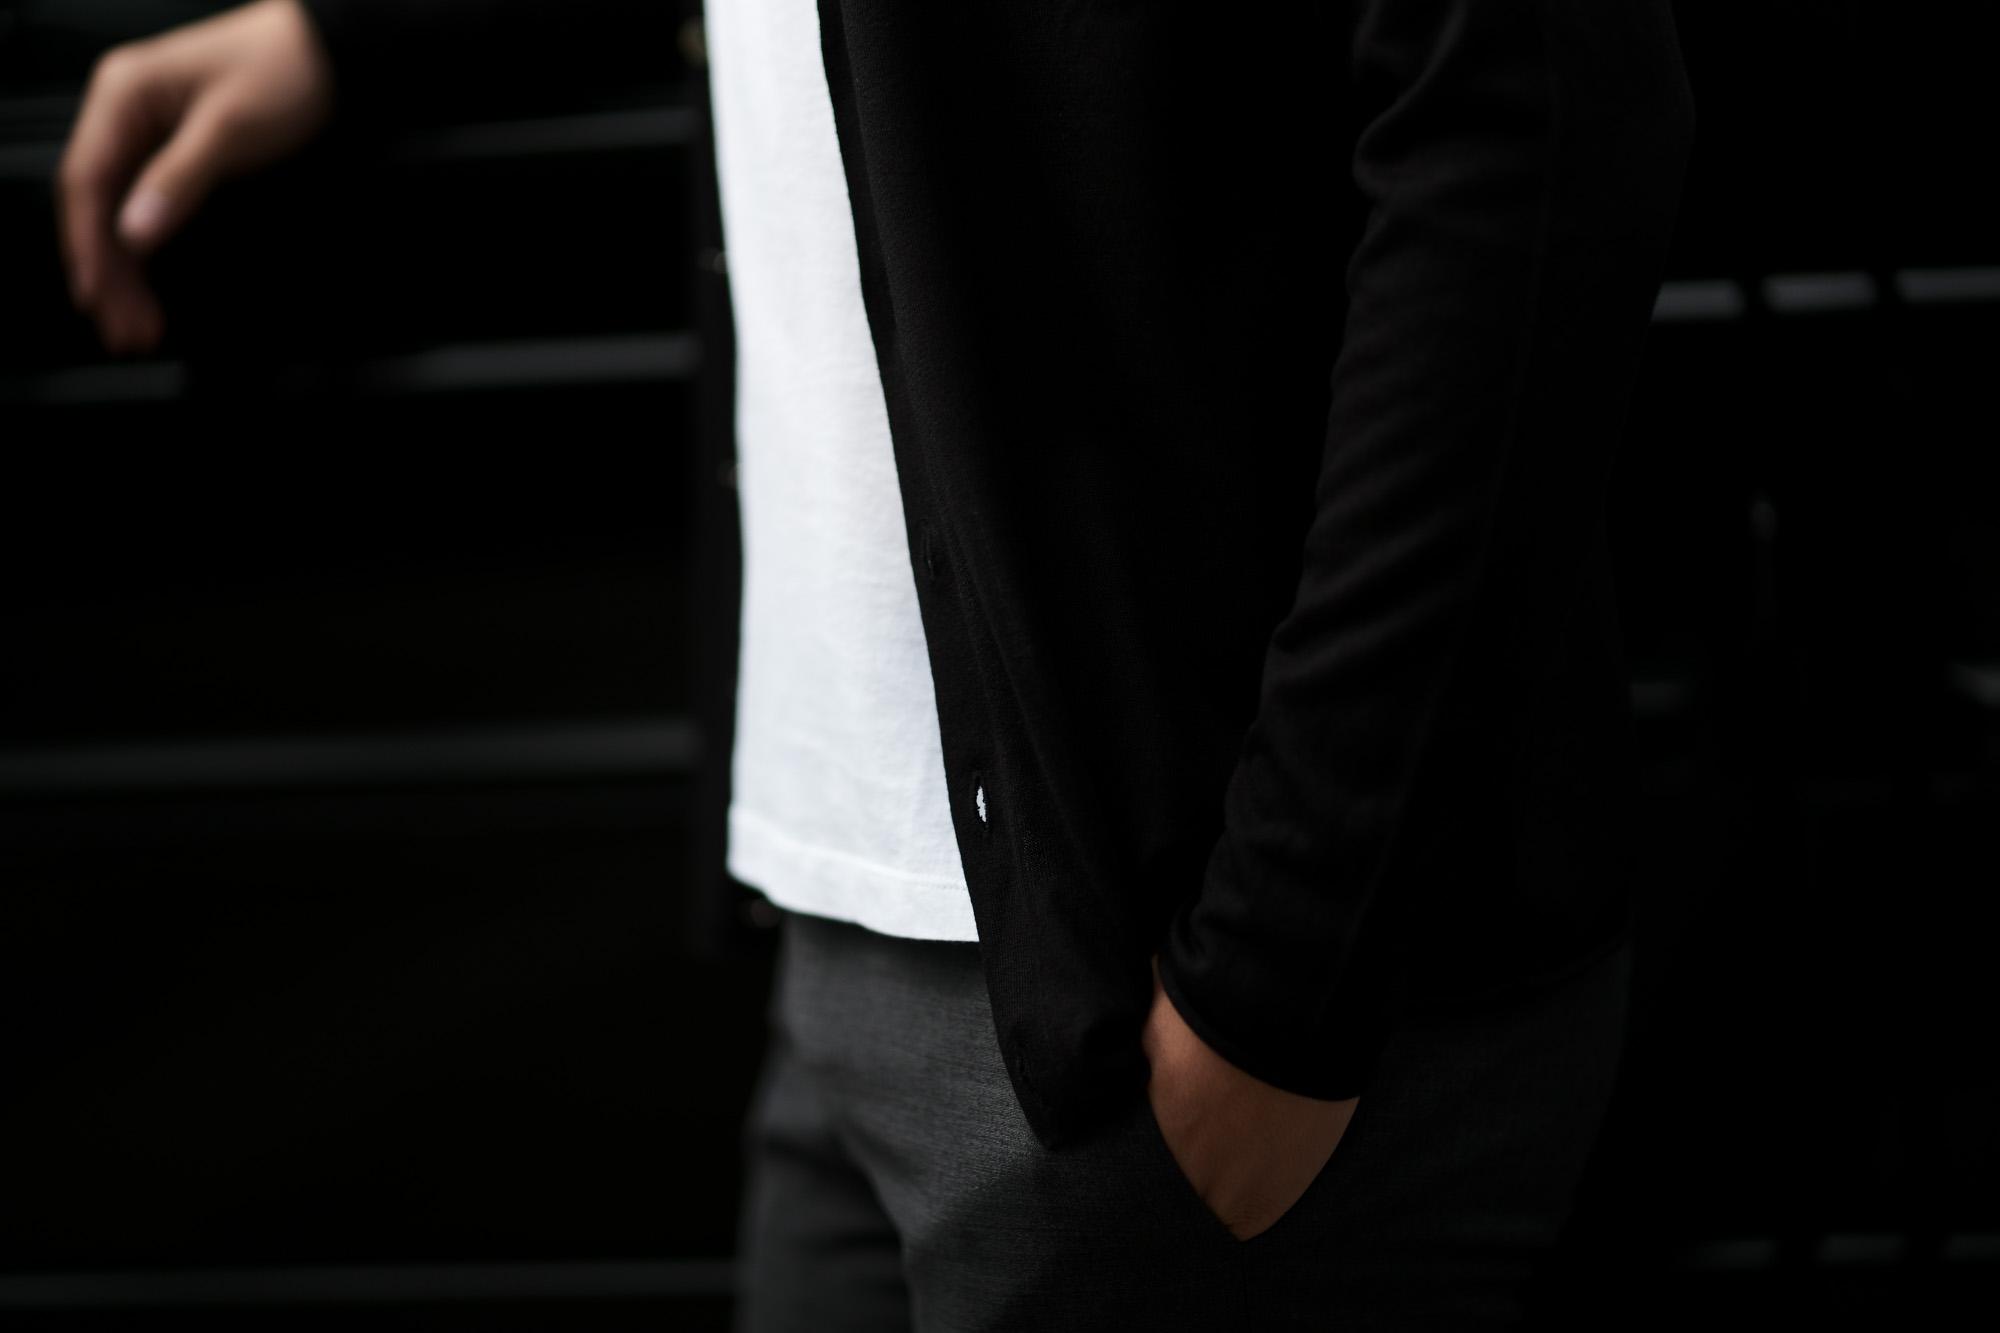 lucien pellat-finet (ルシアン ペラフィネ) V-Neck Cardigan シルクカシミア スカルスター Vネック カーディガン BLACK (ブラック) 2019 春夏新作 lucienpellatfinet ルシアンペラフィネ alto e diritto アルトエデリット 愛知 名古屋 altoediritto